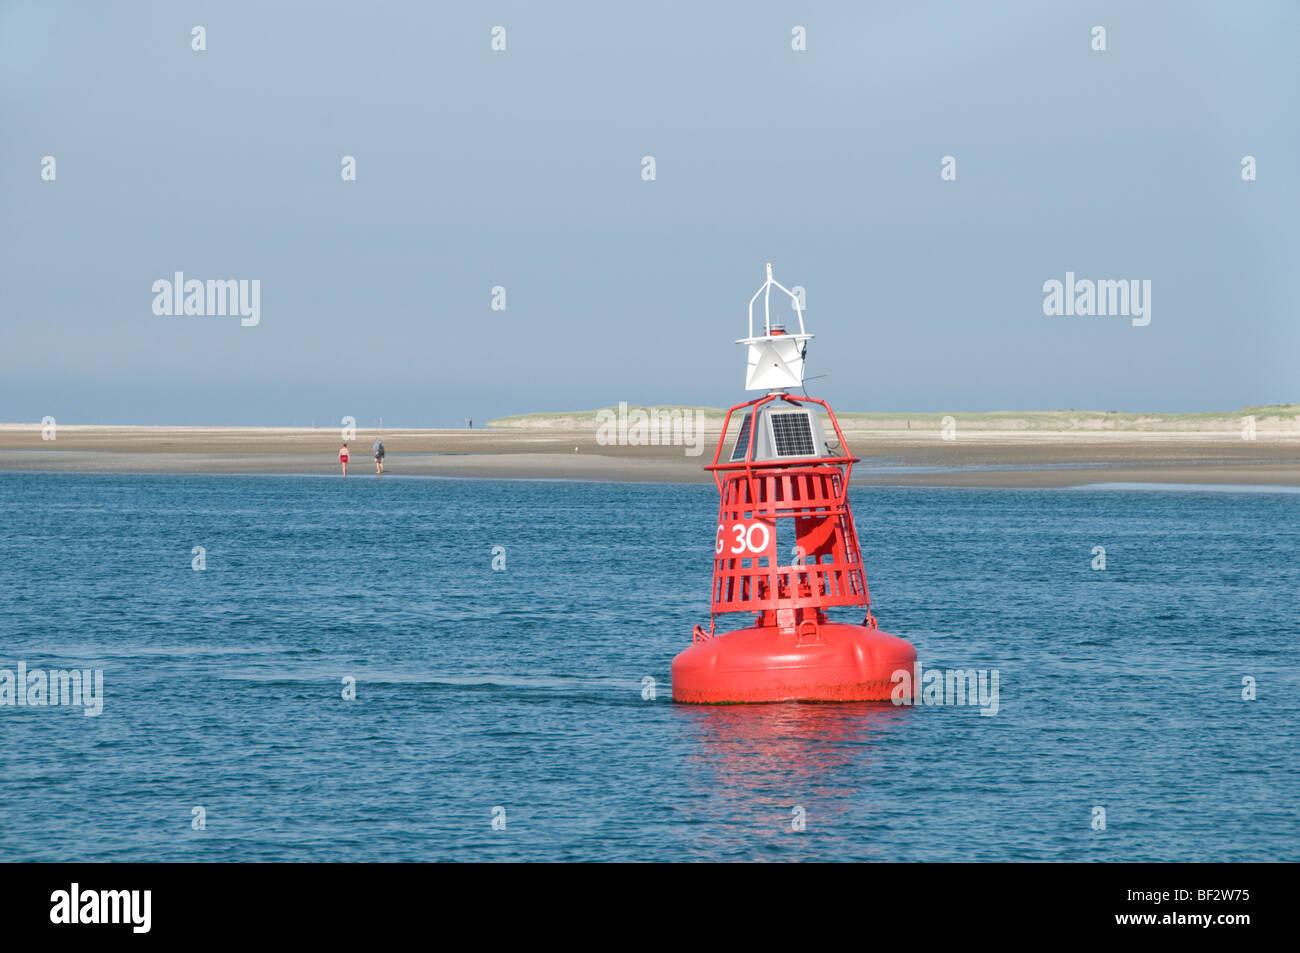 Vlıeland Terschellıng Texel Fishing Netherlands Red Buoy - Stock Image